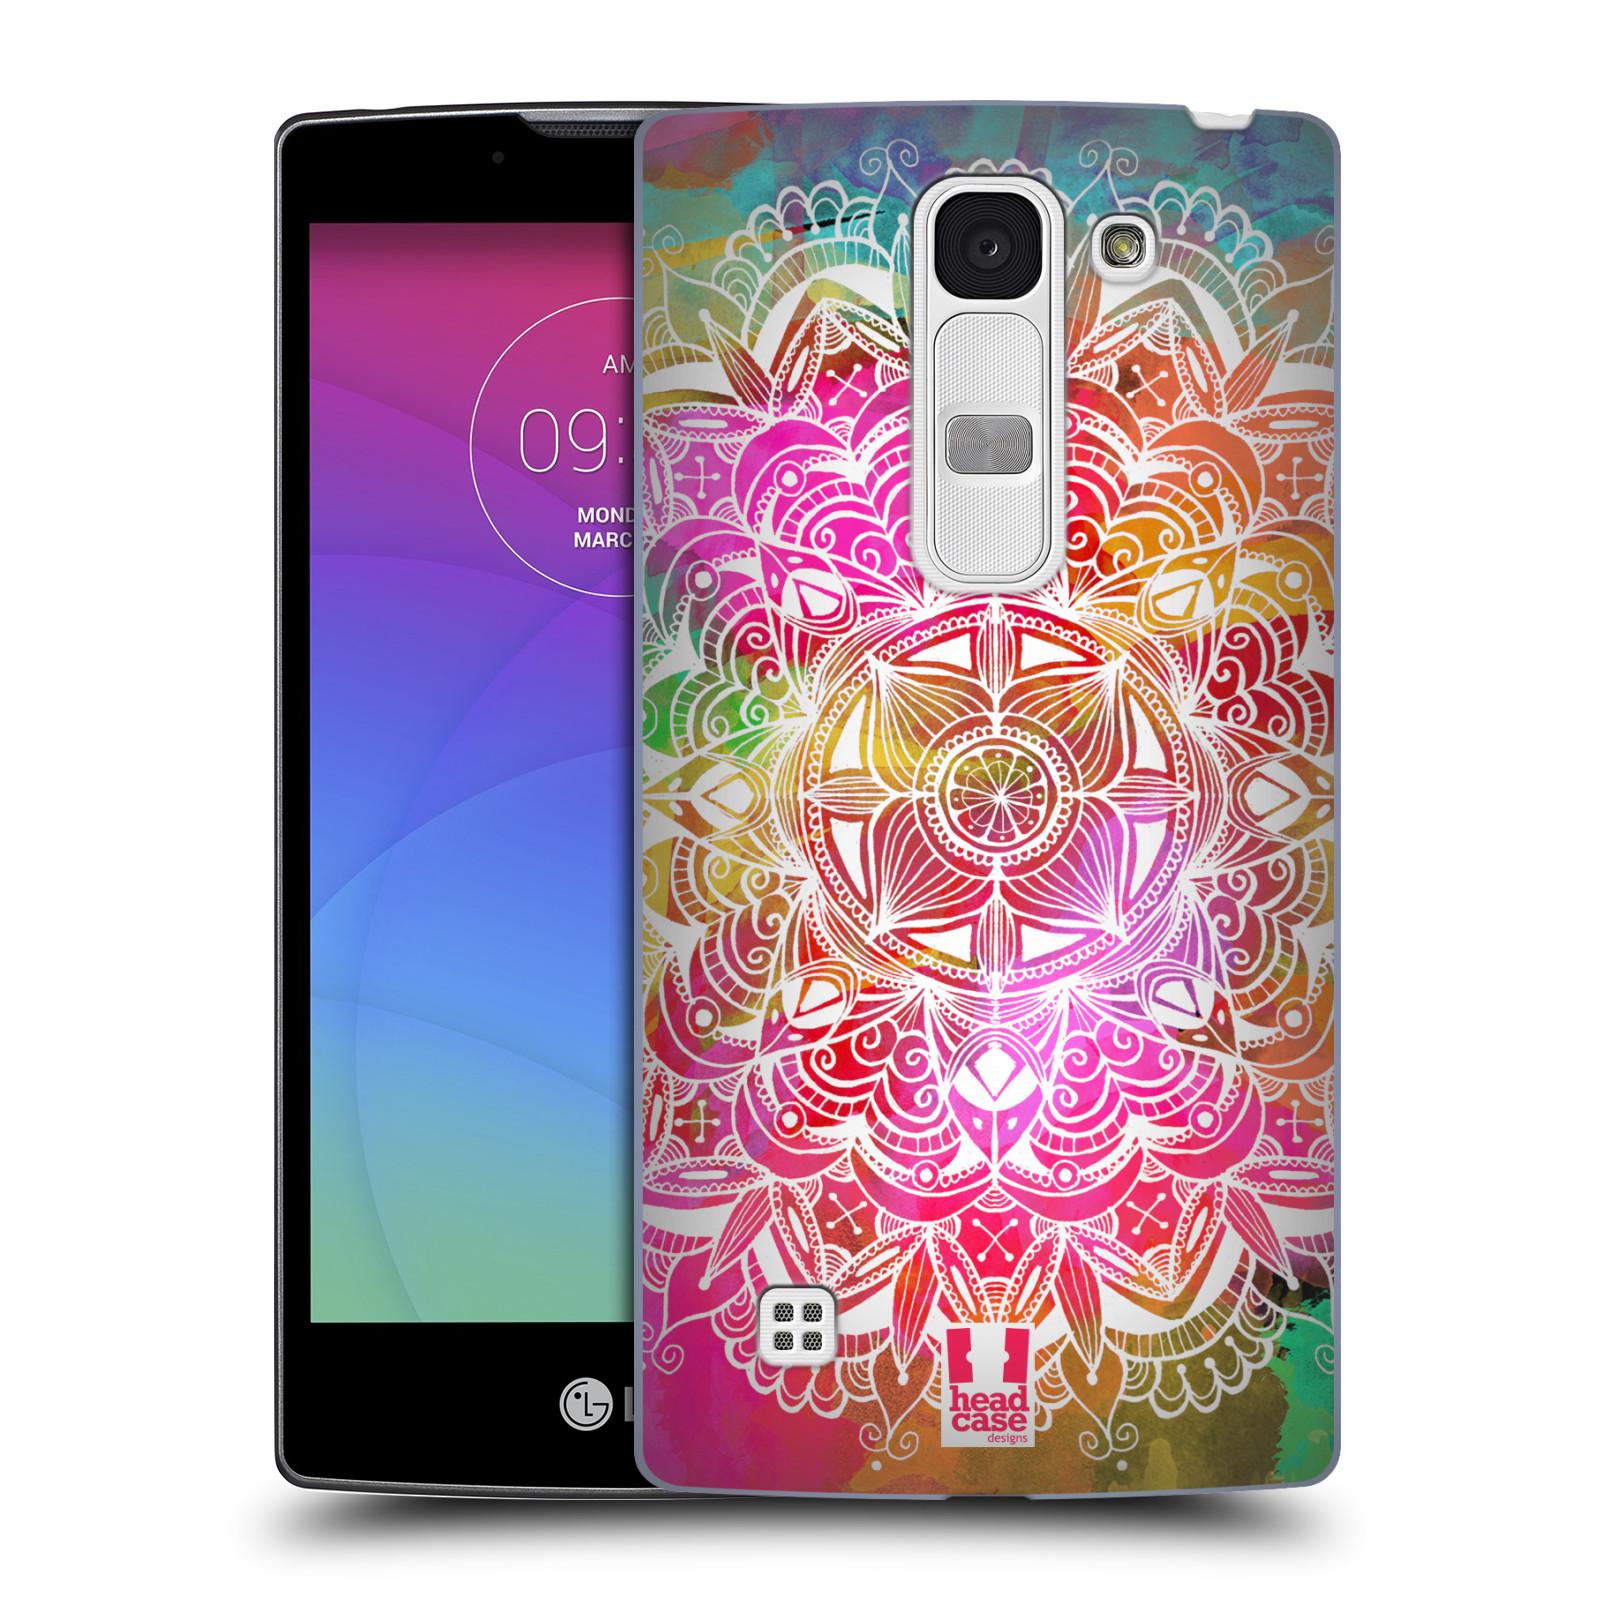 Plastové pouzdro na mobil LG Spirit LTE HEAD CASE Mandala Doodle Watercolour (Kryt či obal na mobilní telefon LG Spirit H420 a LG Spirit LTE H440N)